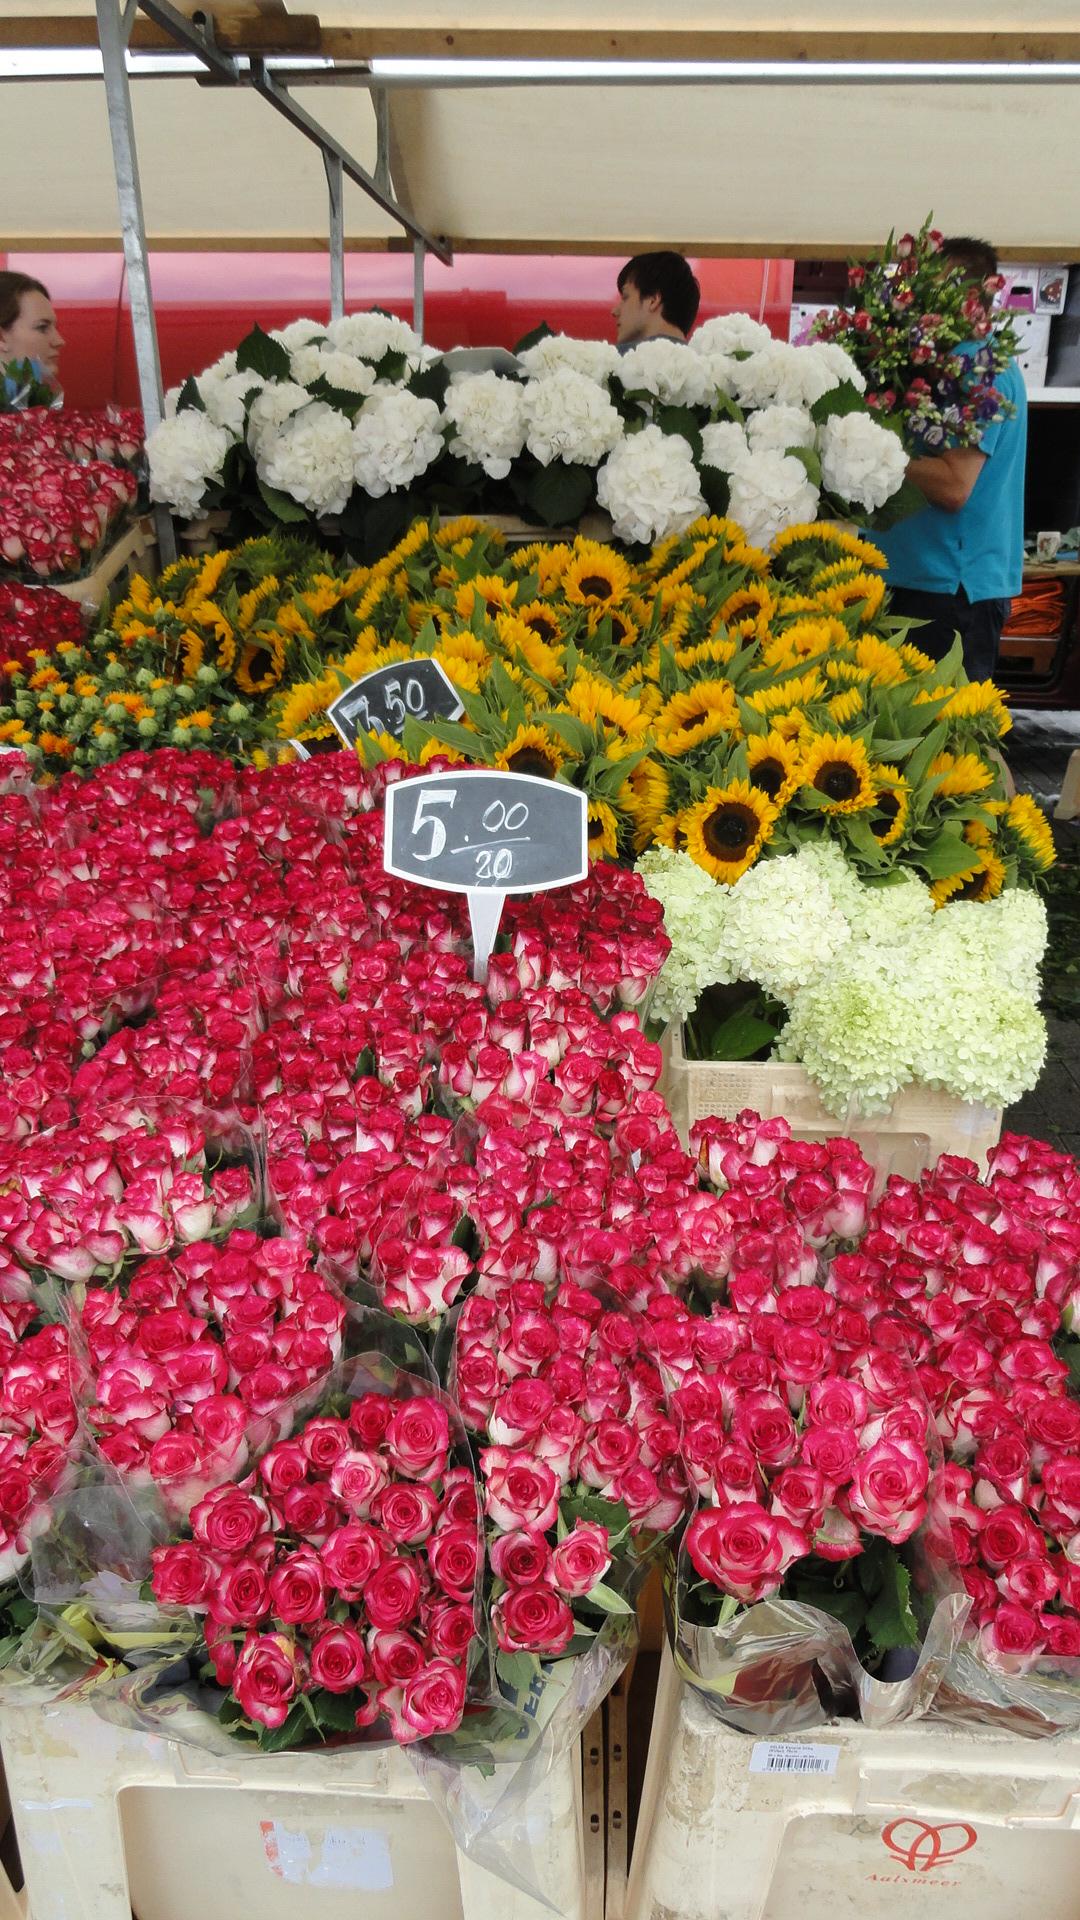 Rotterdam - Marché de Binnenrotte - Fleurs